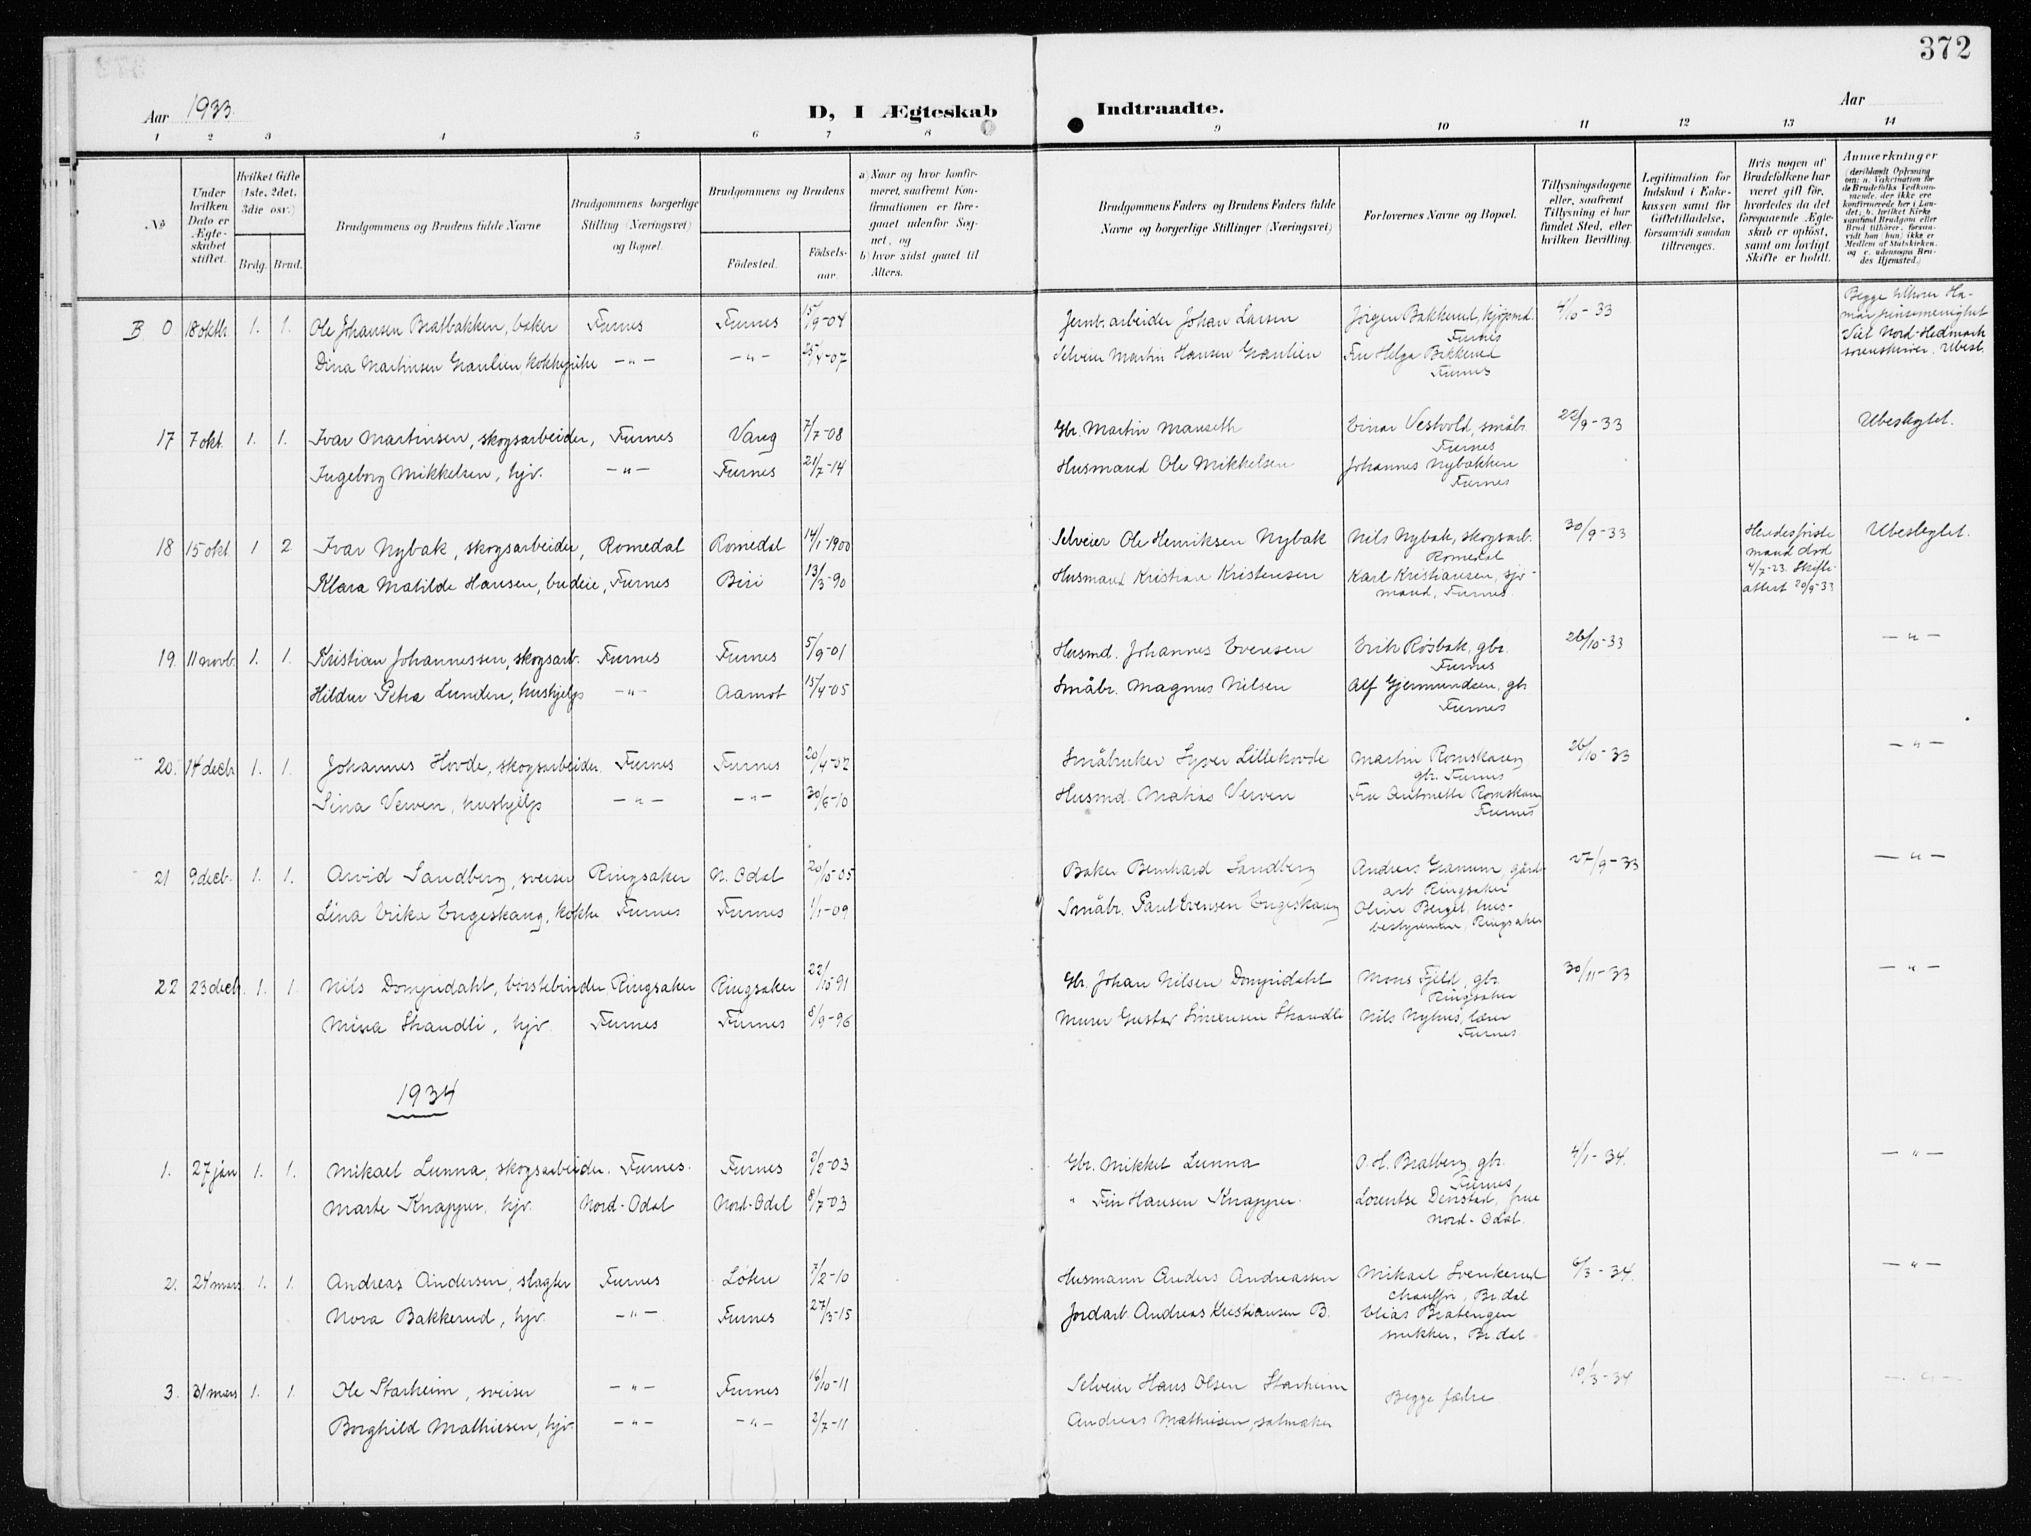 SAH, Furnes prestekontor, K/Ka/L0001: Ministerialbok nr. 1, 1907-1935, s. 372